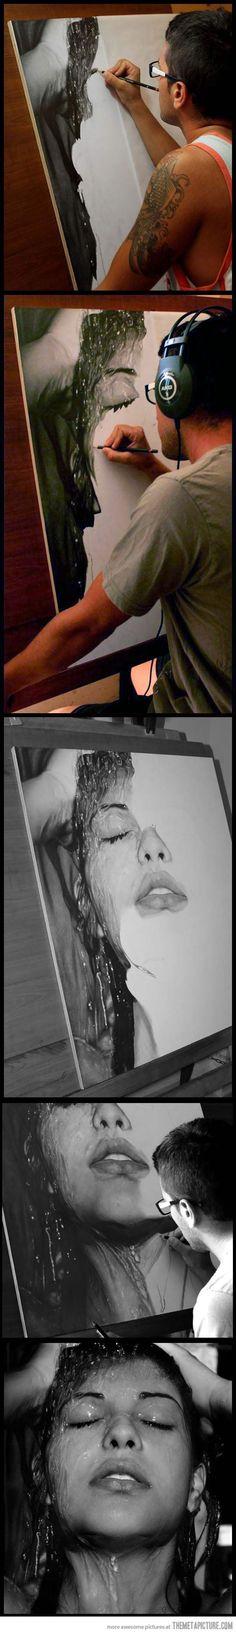 """Sensazioni"" - Diego Fazio, progressive studio artwork {contemporary artist beautiful #hyperreal female head woman face photorealism portrait b+w drawing} <3 http://diegokoi.deviantart.com/art/Sensazioni-331828679?q=gallery:diegokoi/25937209=0"